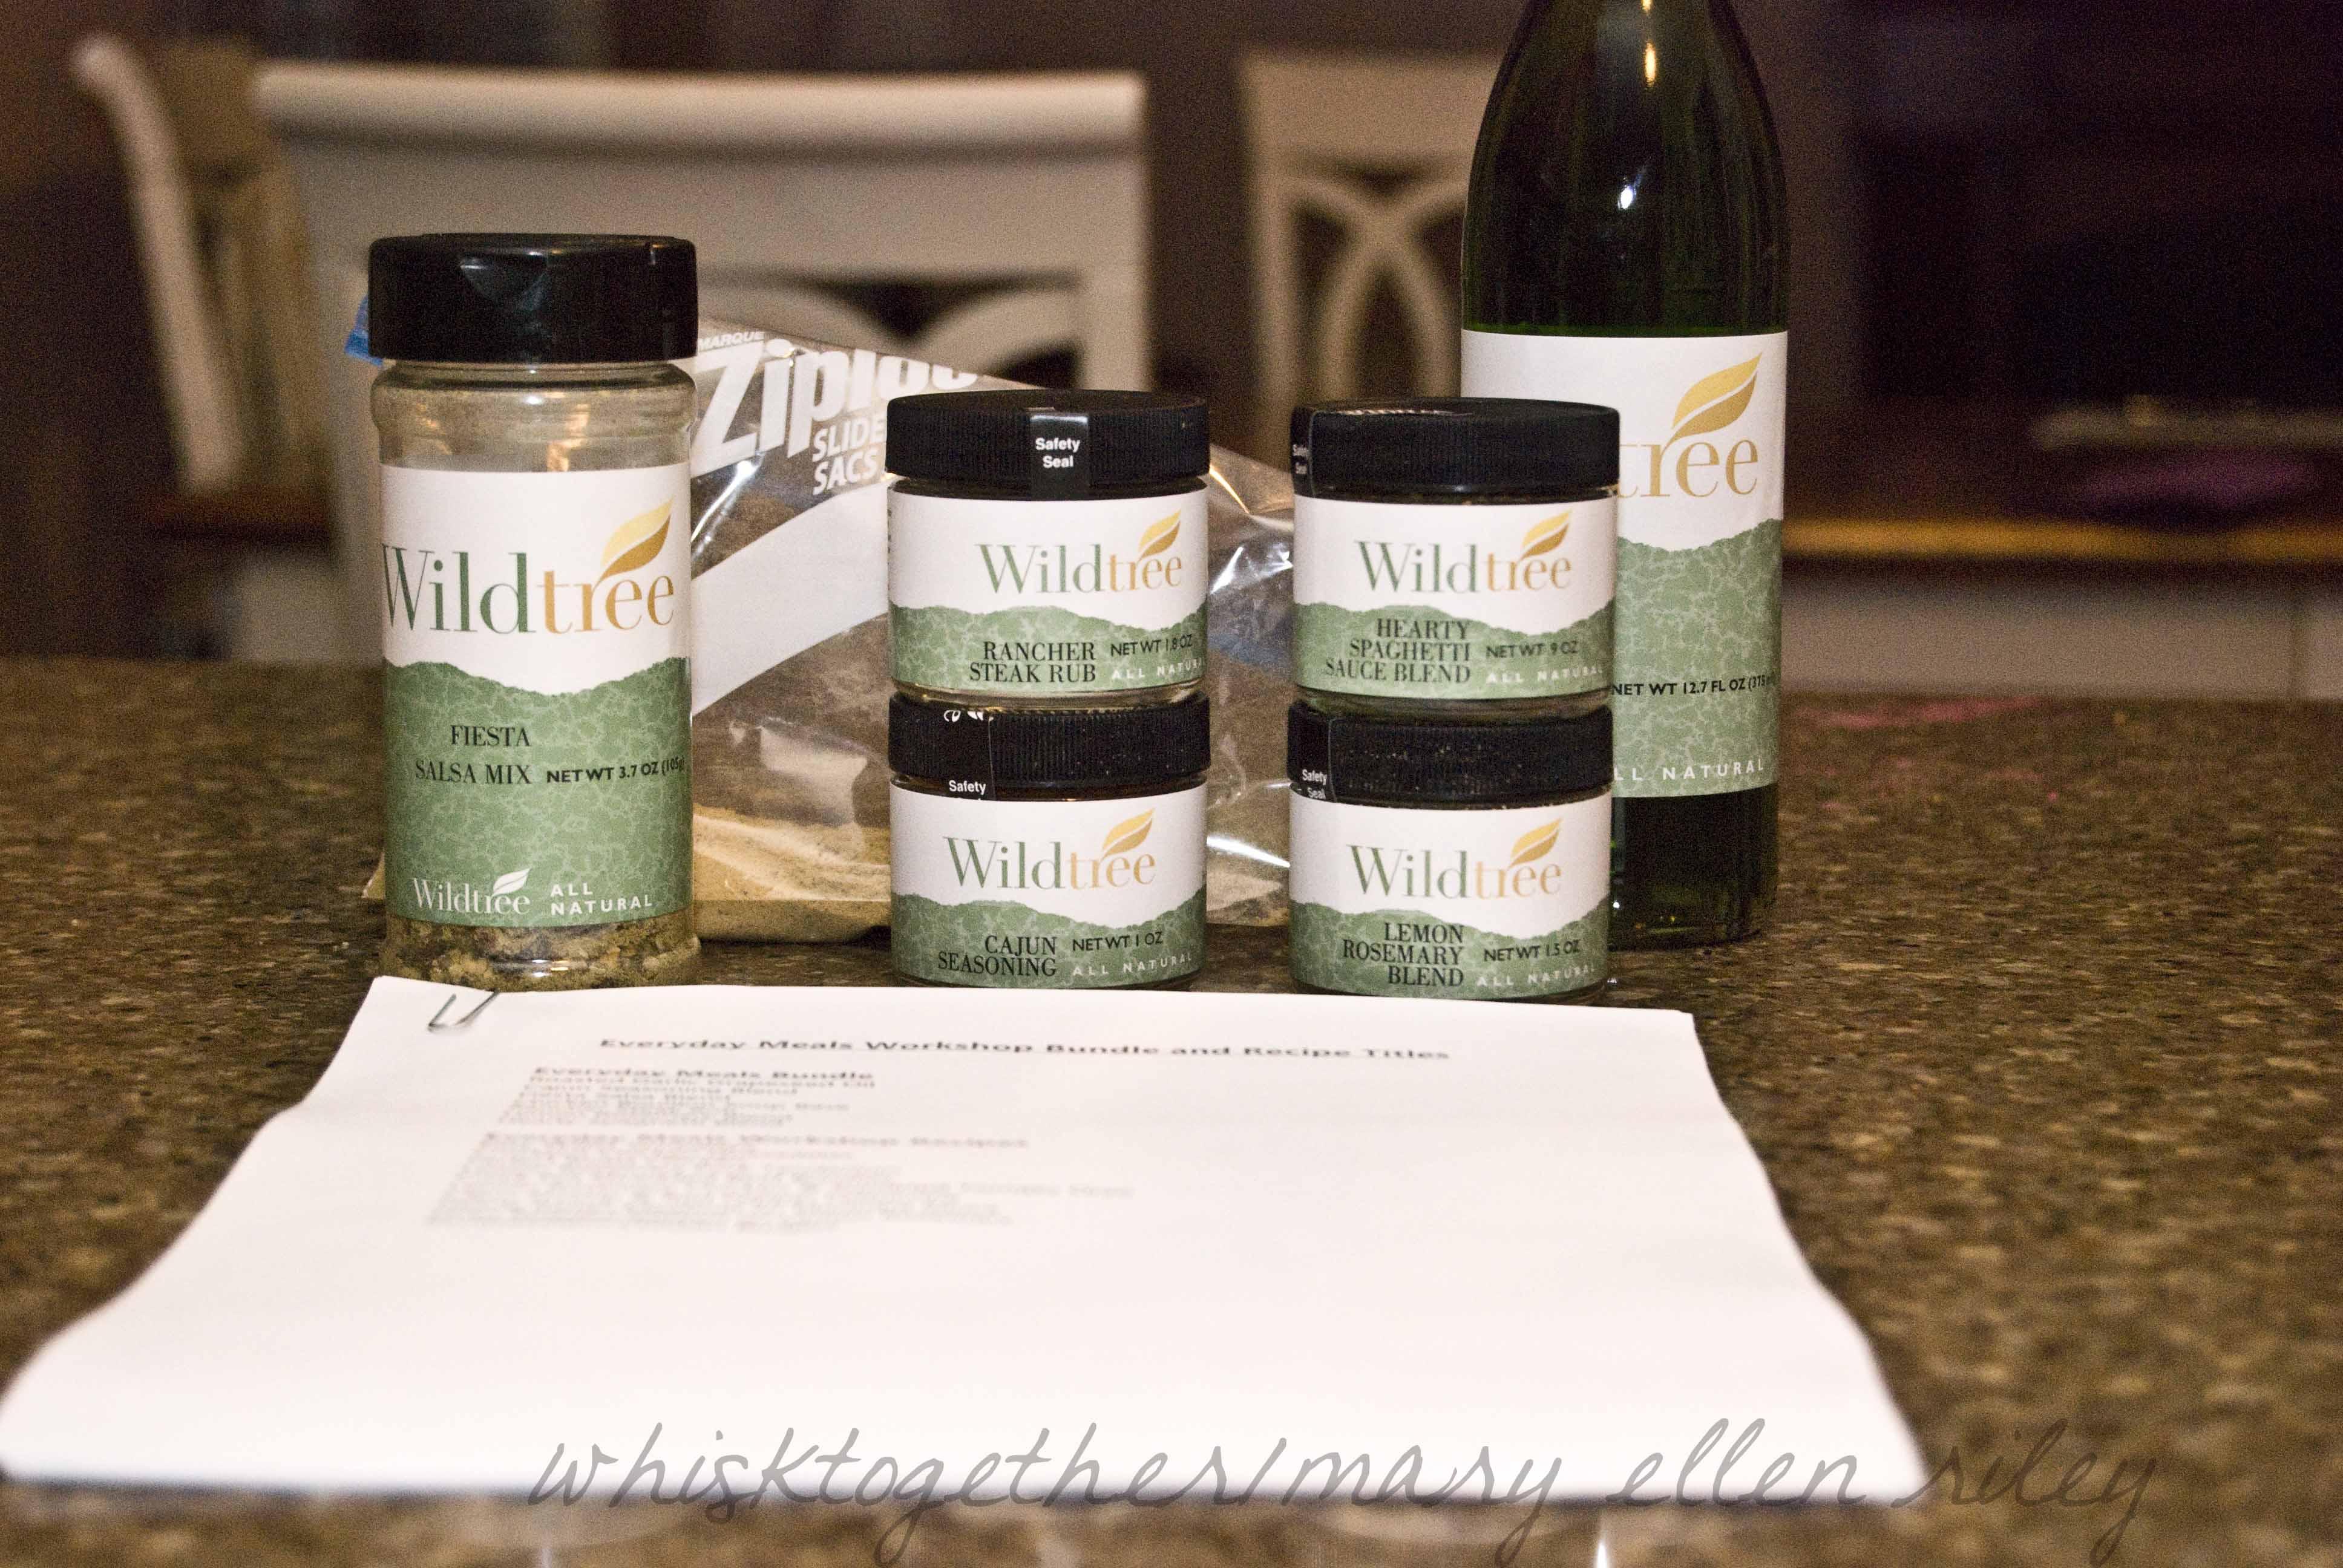 Wildtree Everyday Freezer Meal Workshop_1 on Whisk Together